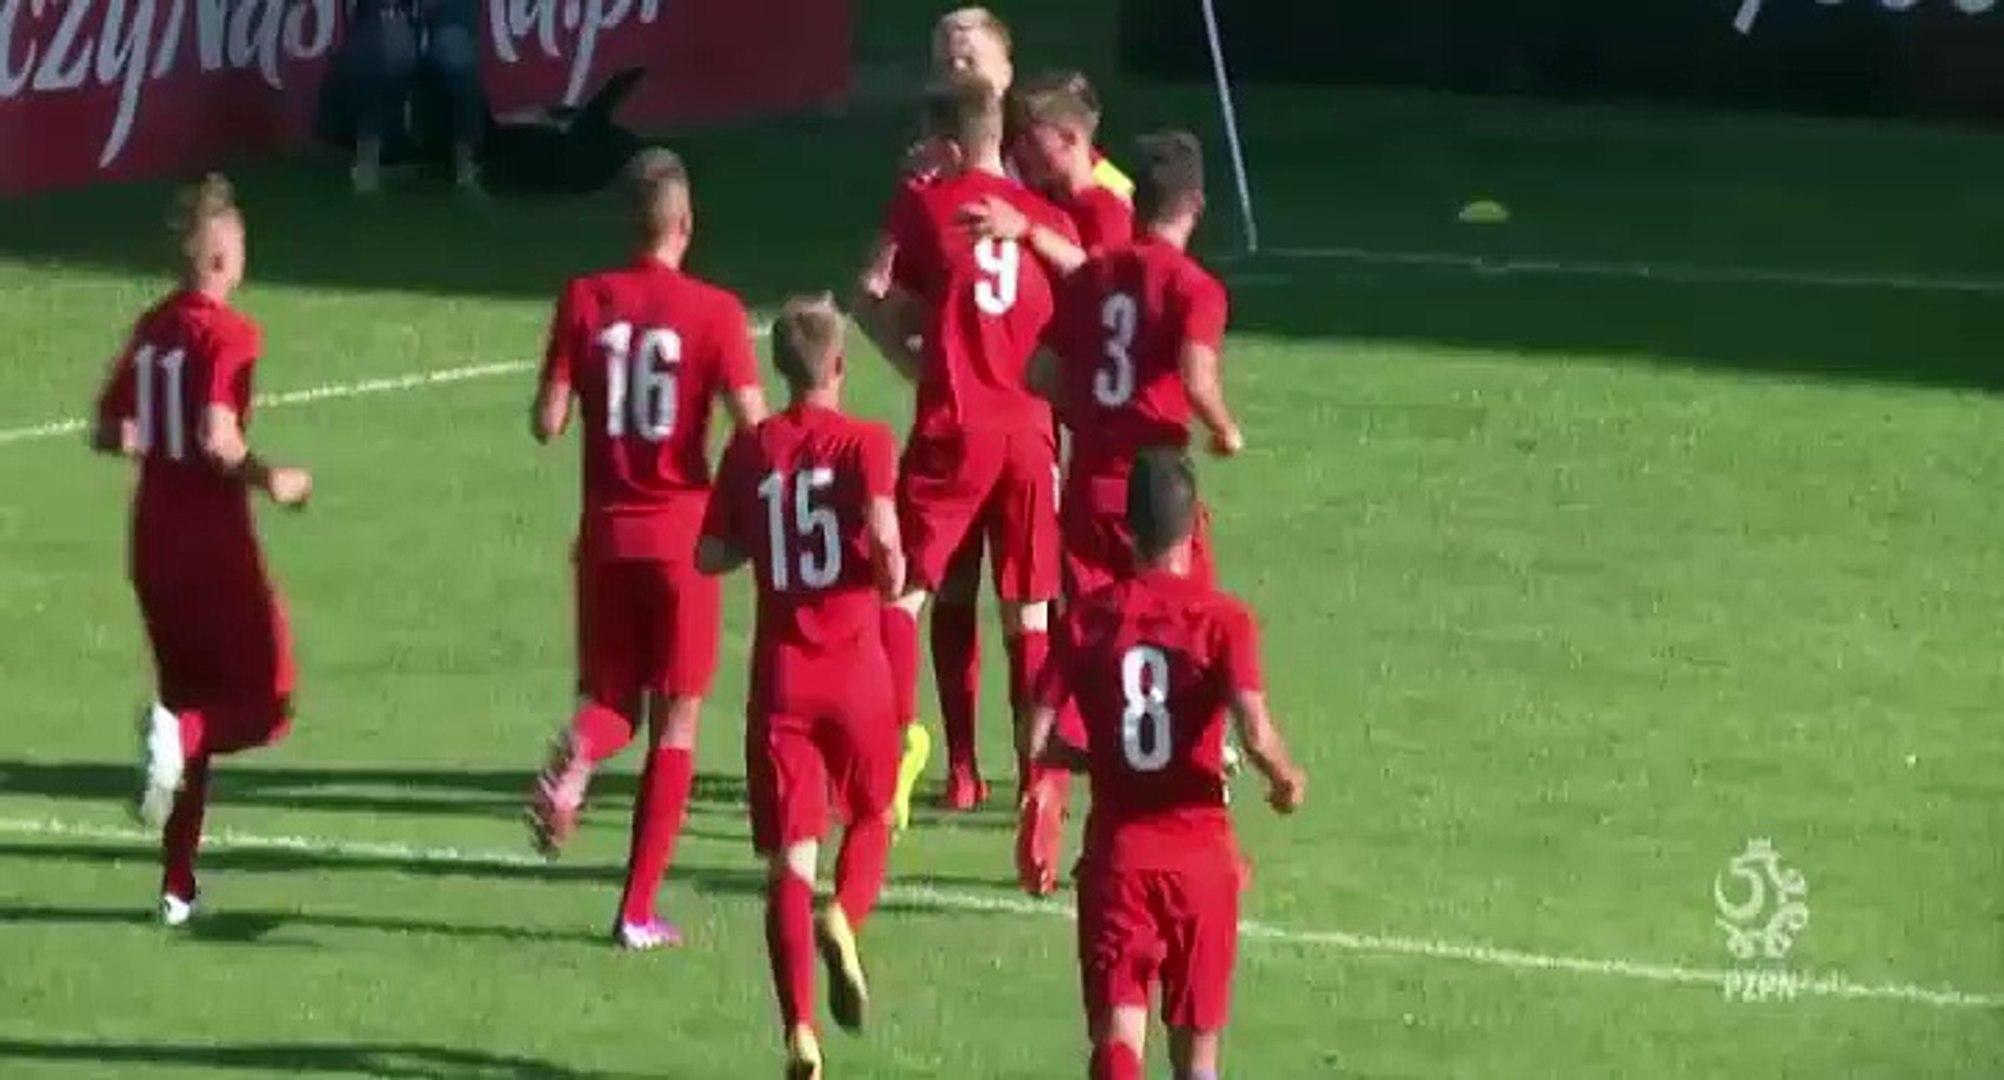 Poland U-17 1-3 Finland U-17 - All Goals (30/8/2016) / Friendly Match